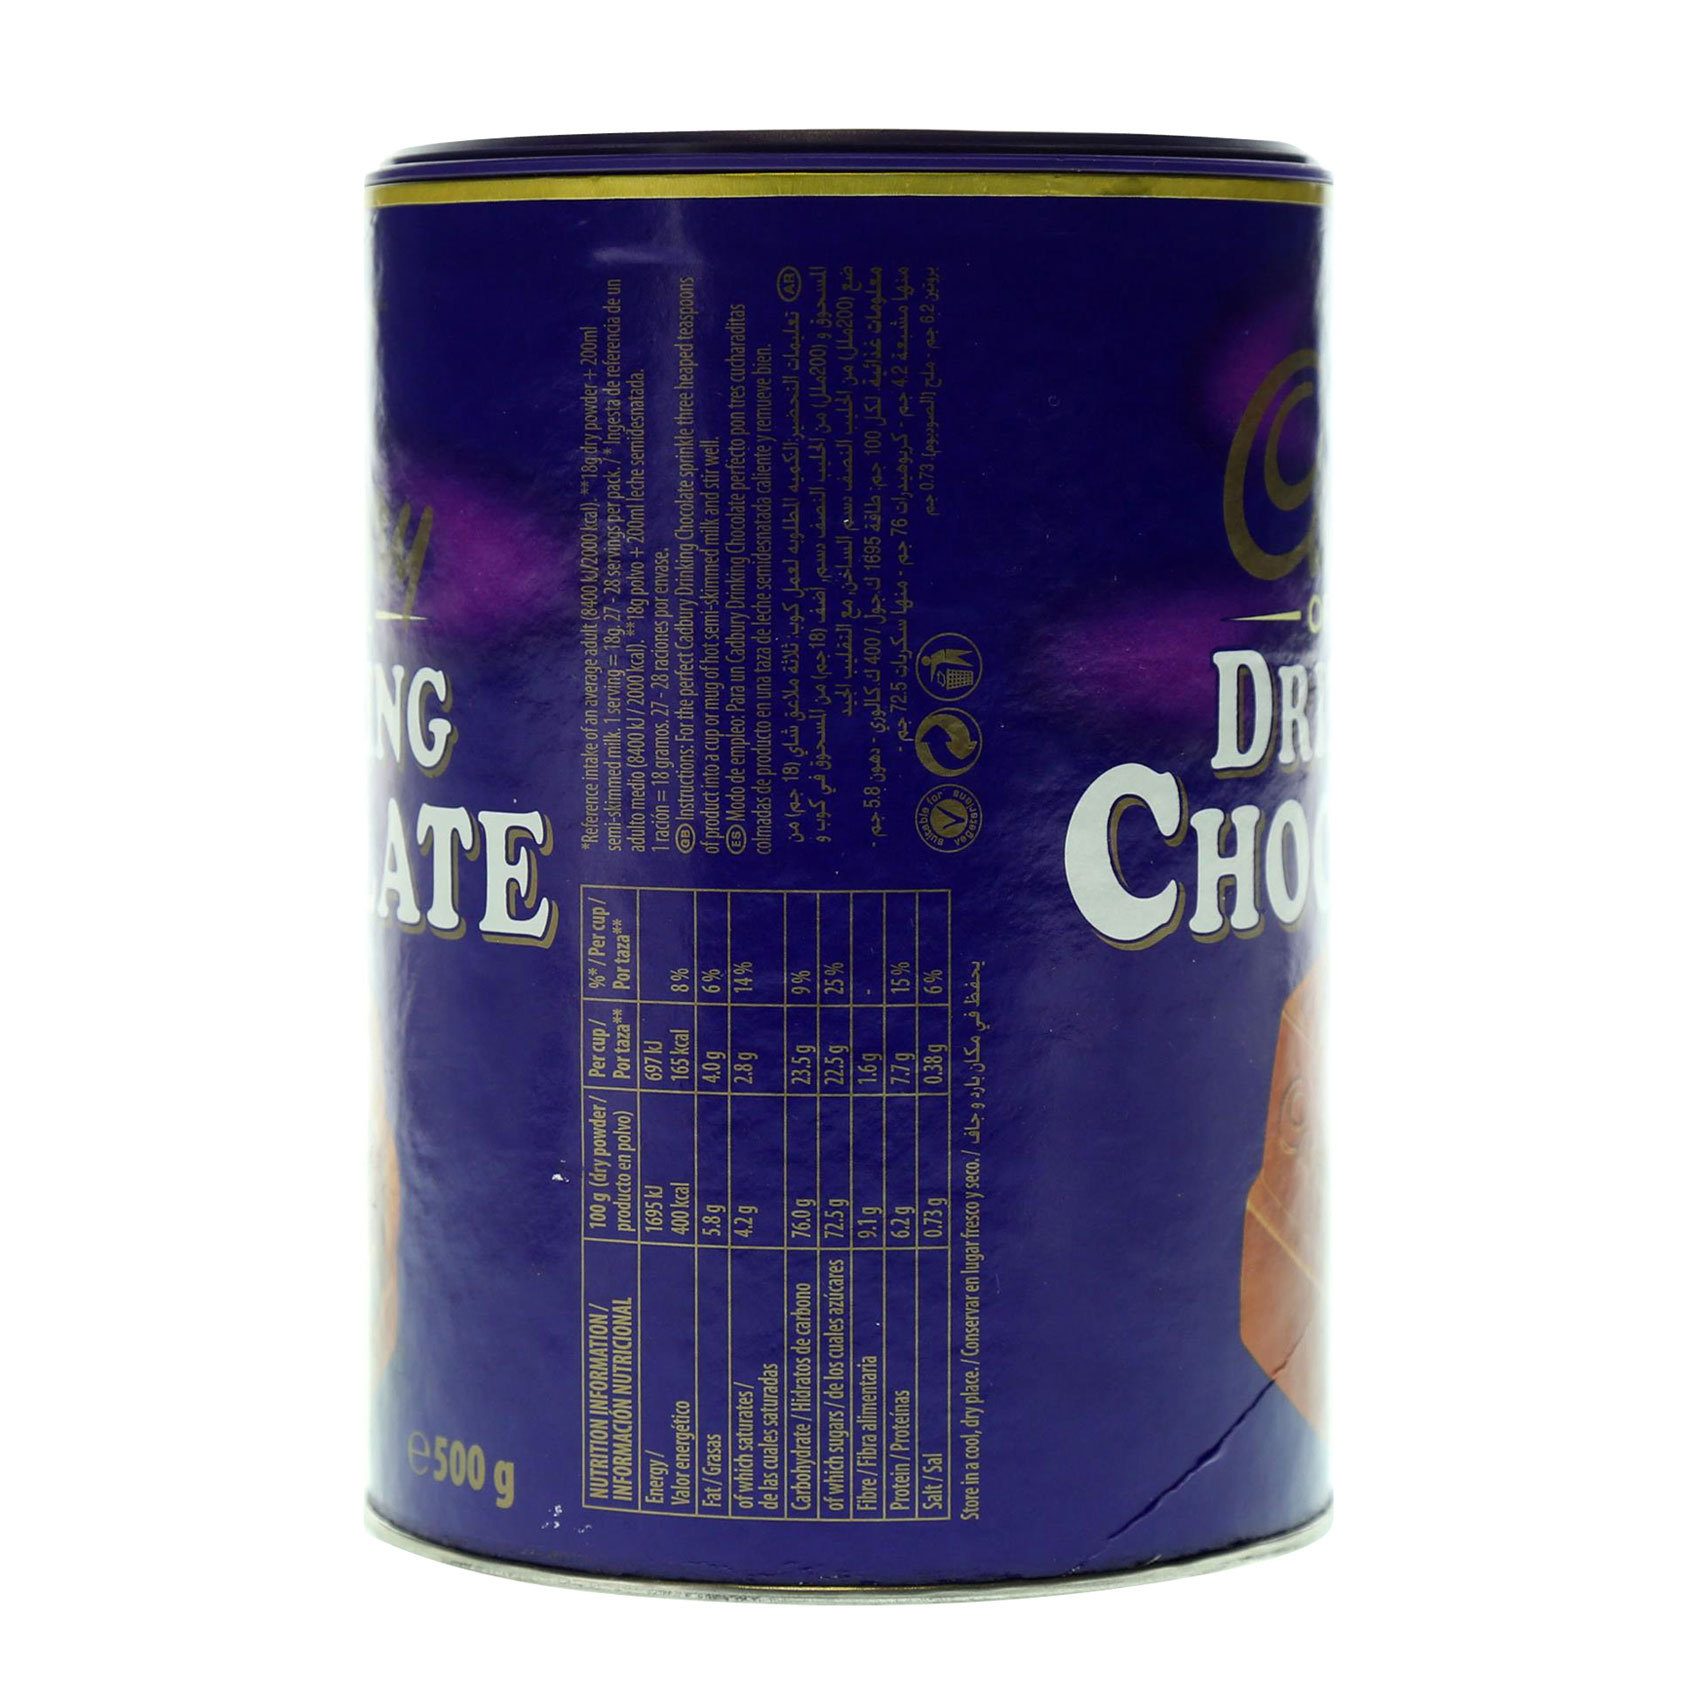 CADBURY DRINKING CHOCO. 500 GR